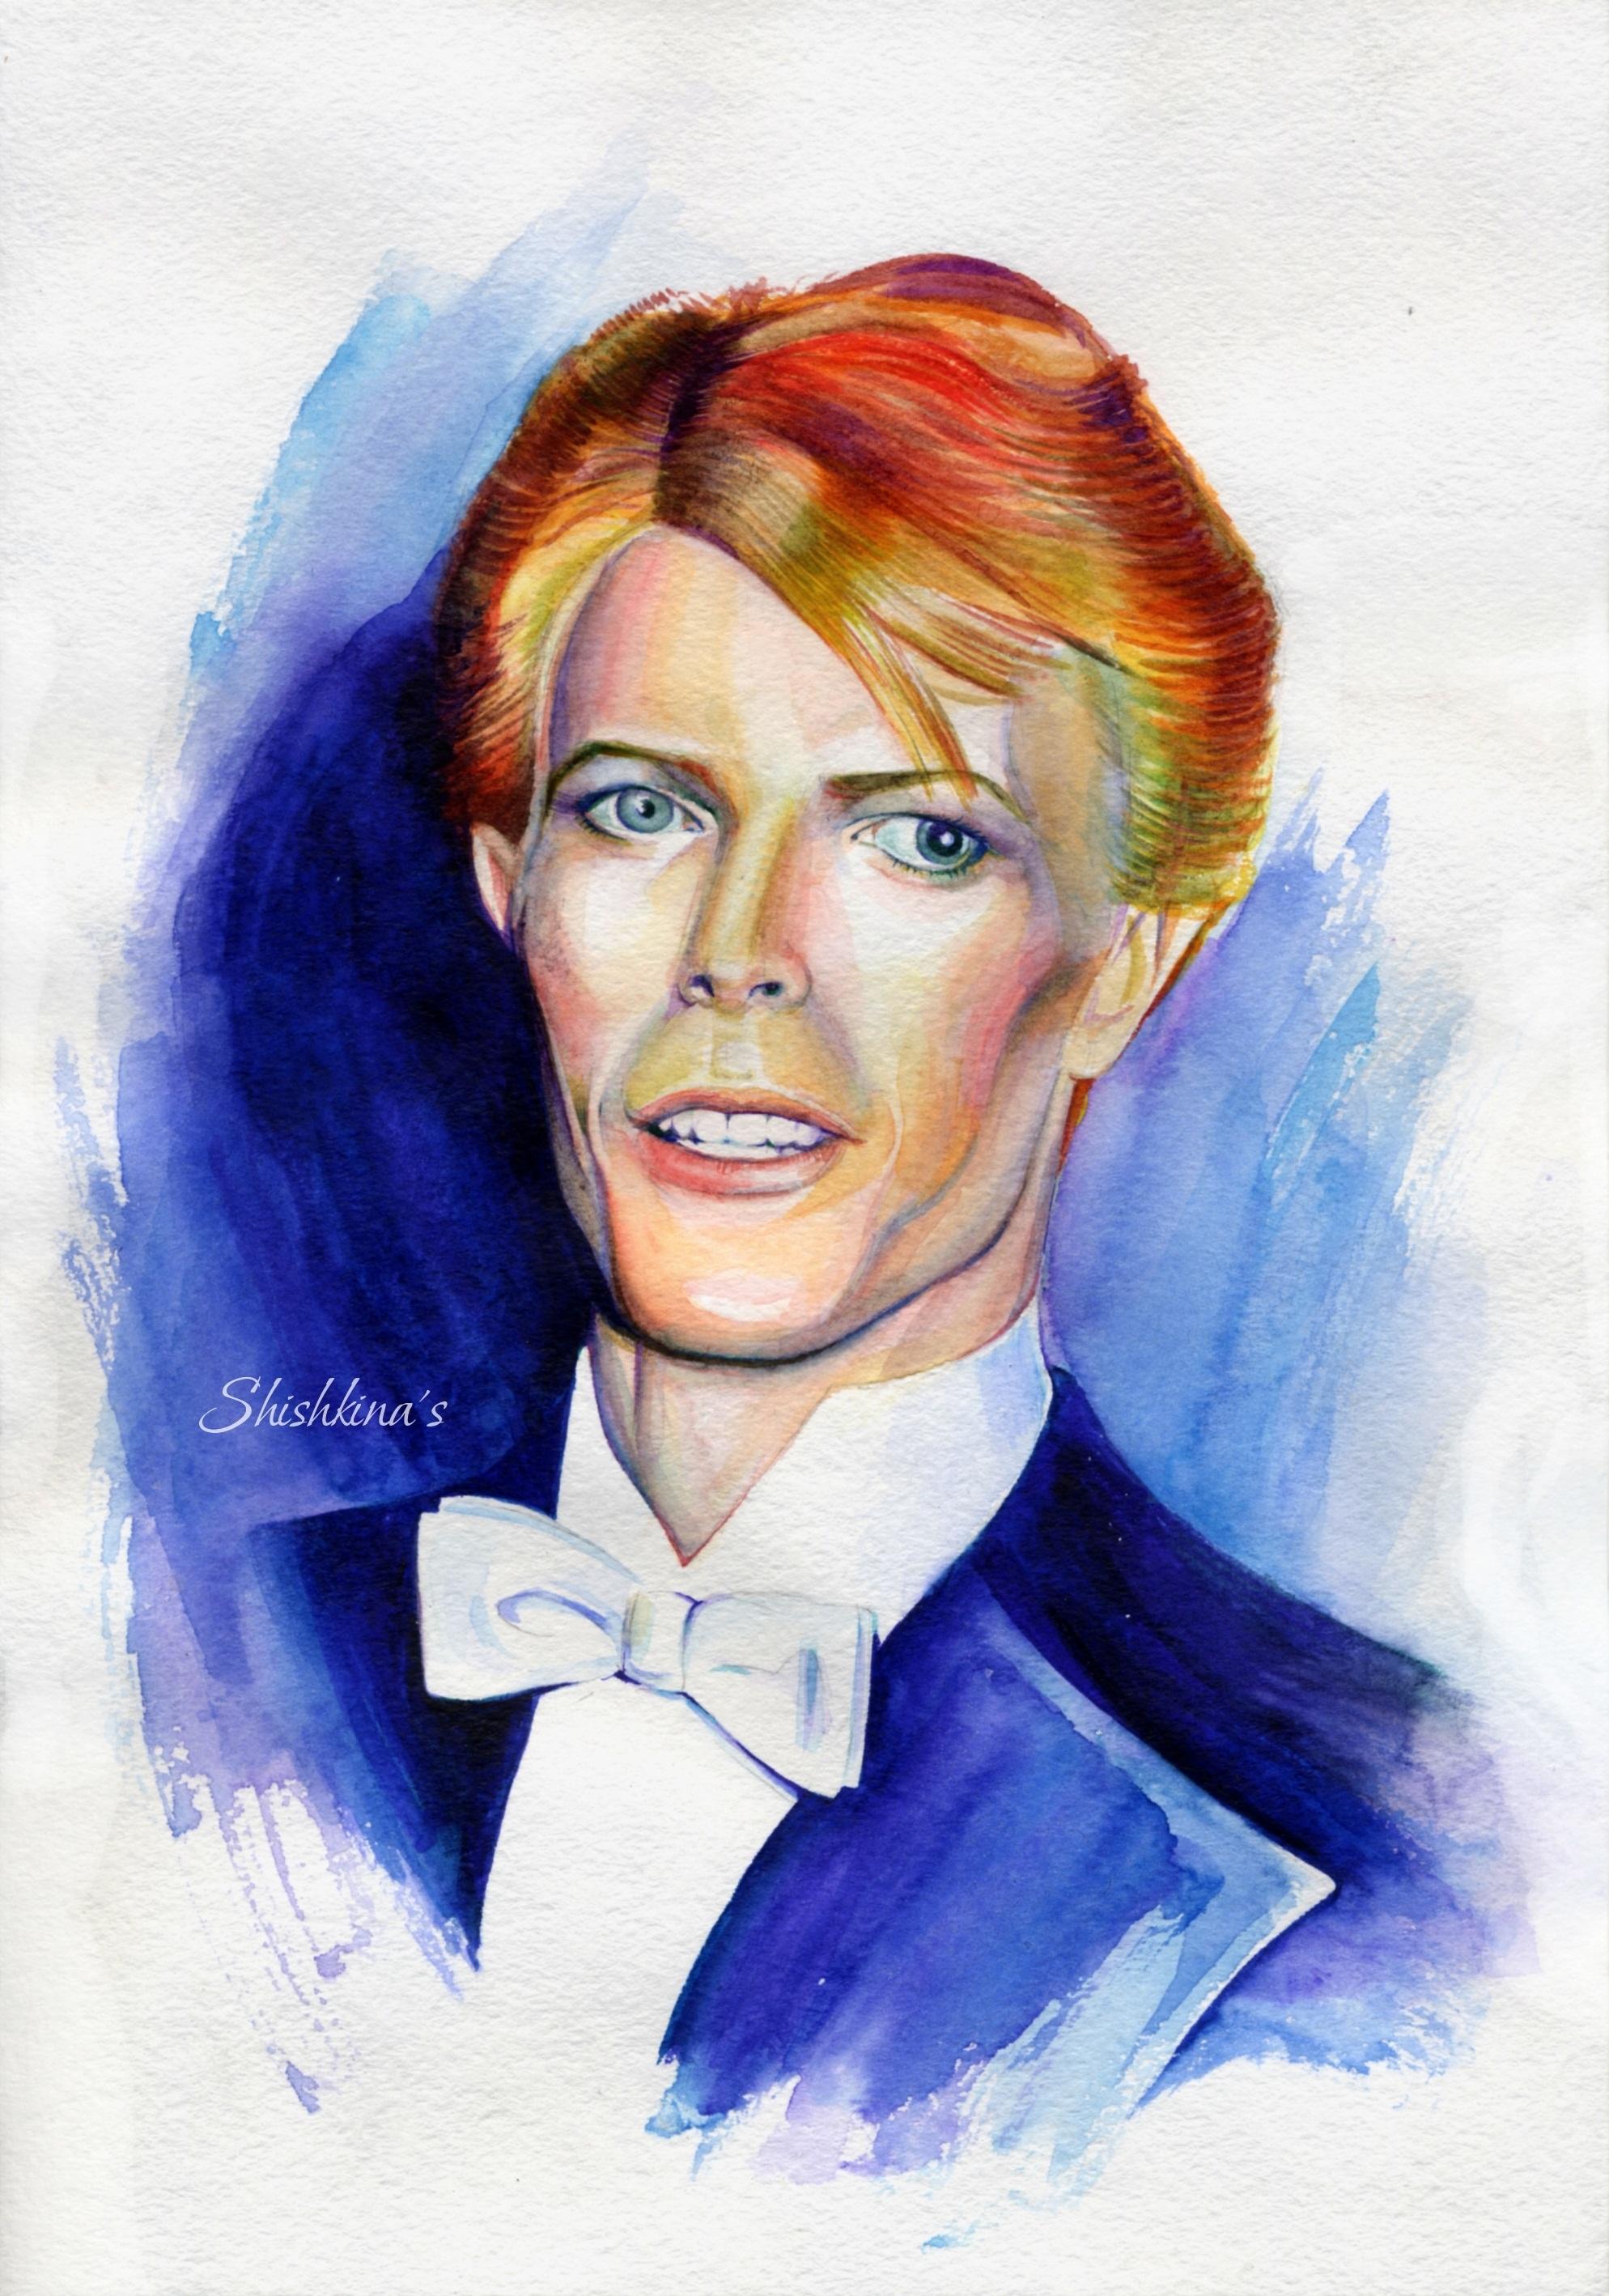 David Bowie by Shishkina